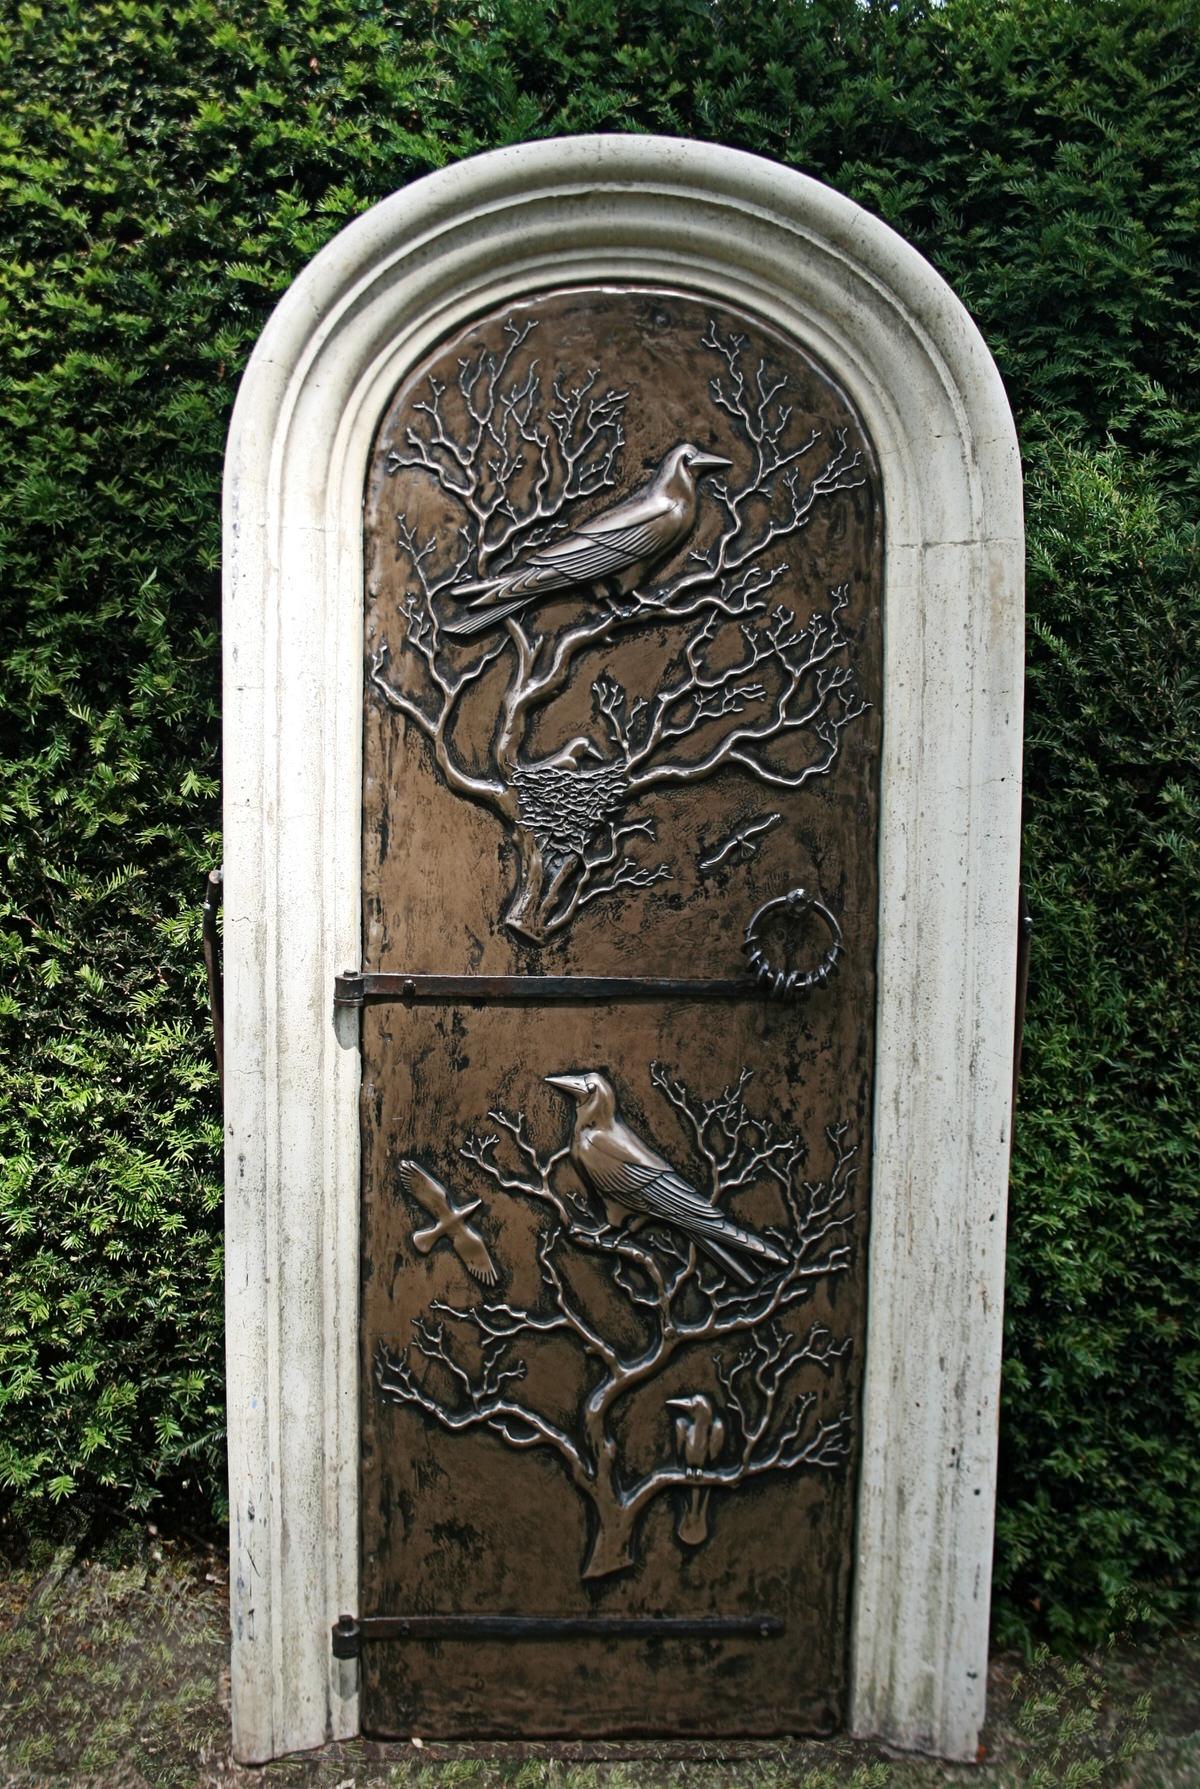 Secret Garden Door Roman Arch walled gared garden sculpture garden freize bronze garden panel enchanted sculpture by Mark Reed